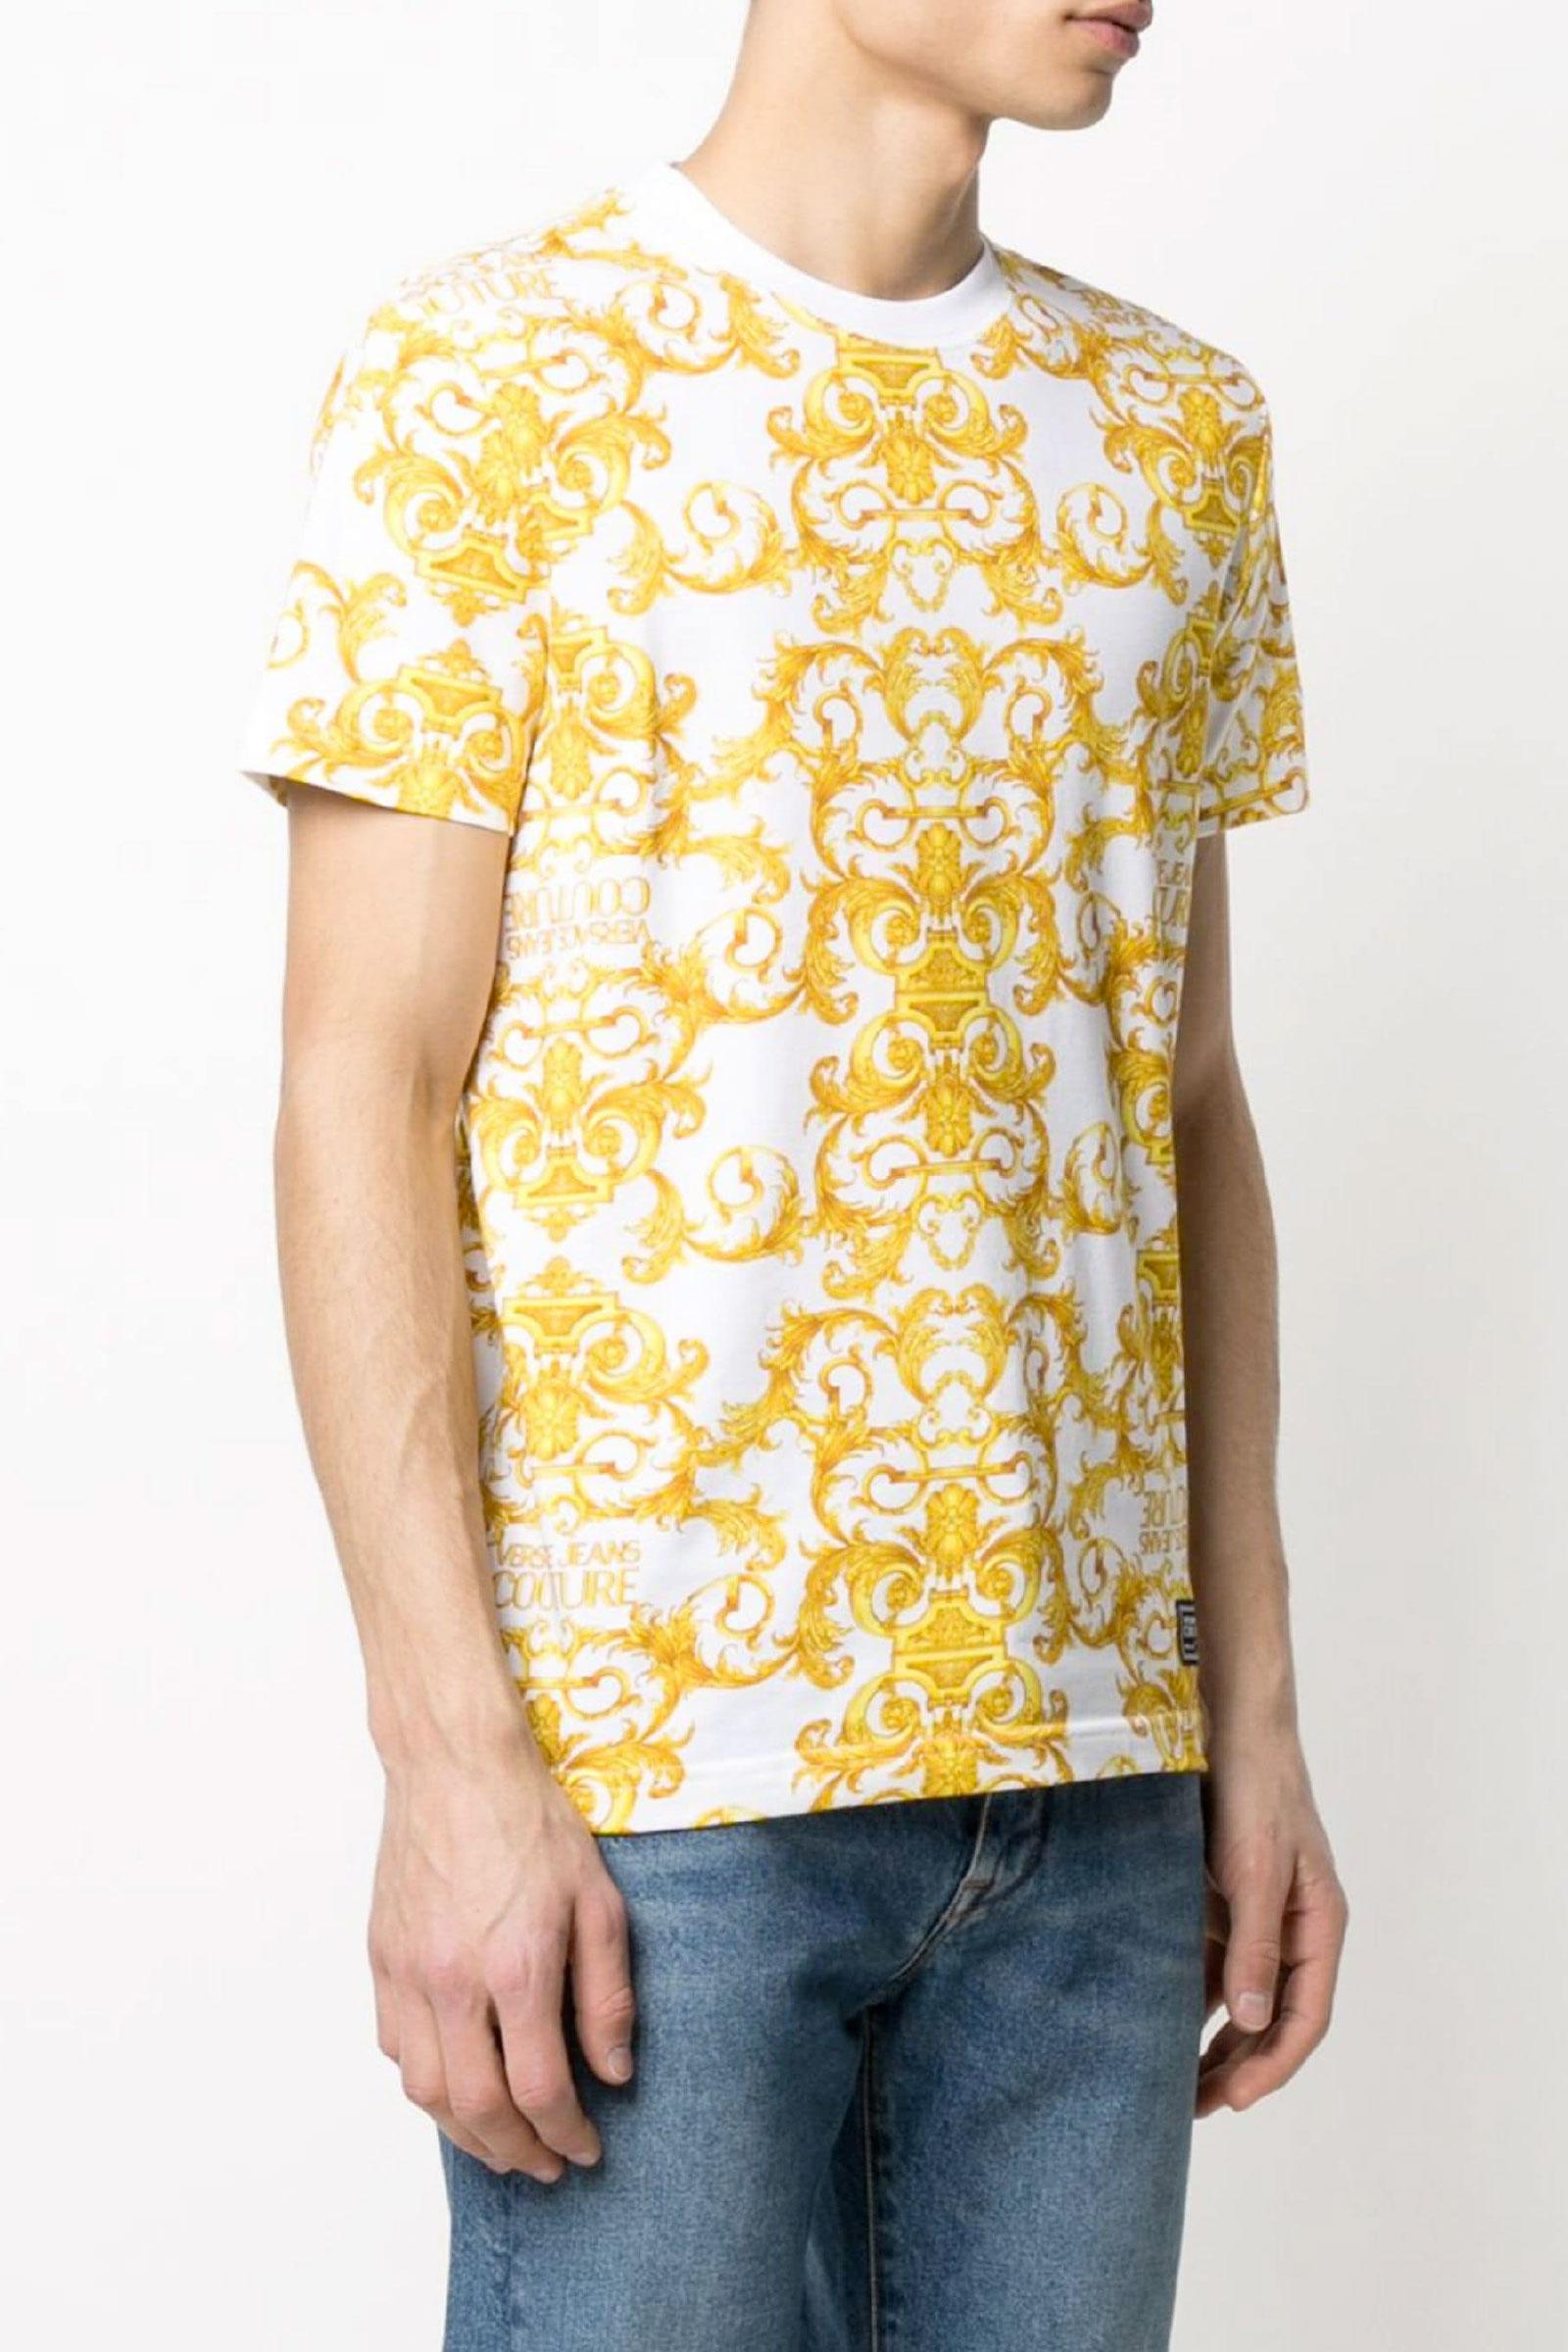 VERSACE JEANS COUTURE Men's T-Shirt VERSACE JEANS COUTURE | T-Shirt | B3GWA7S0S01553